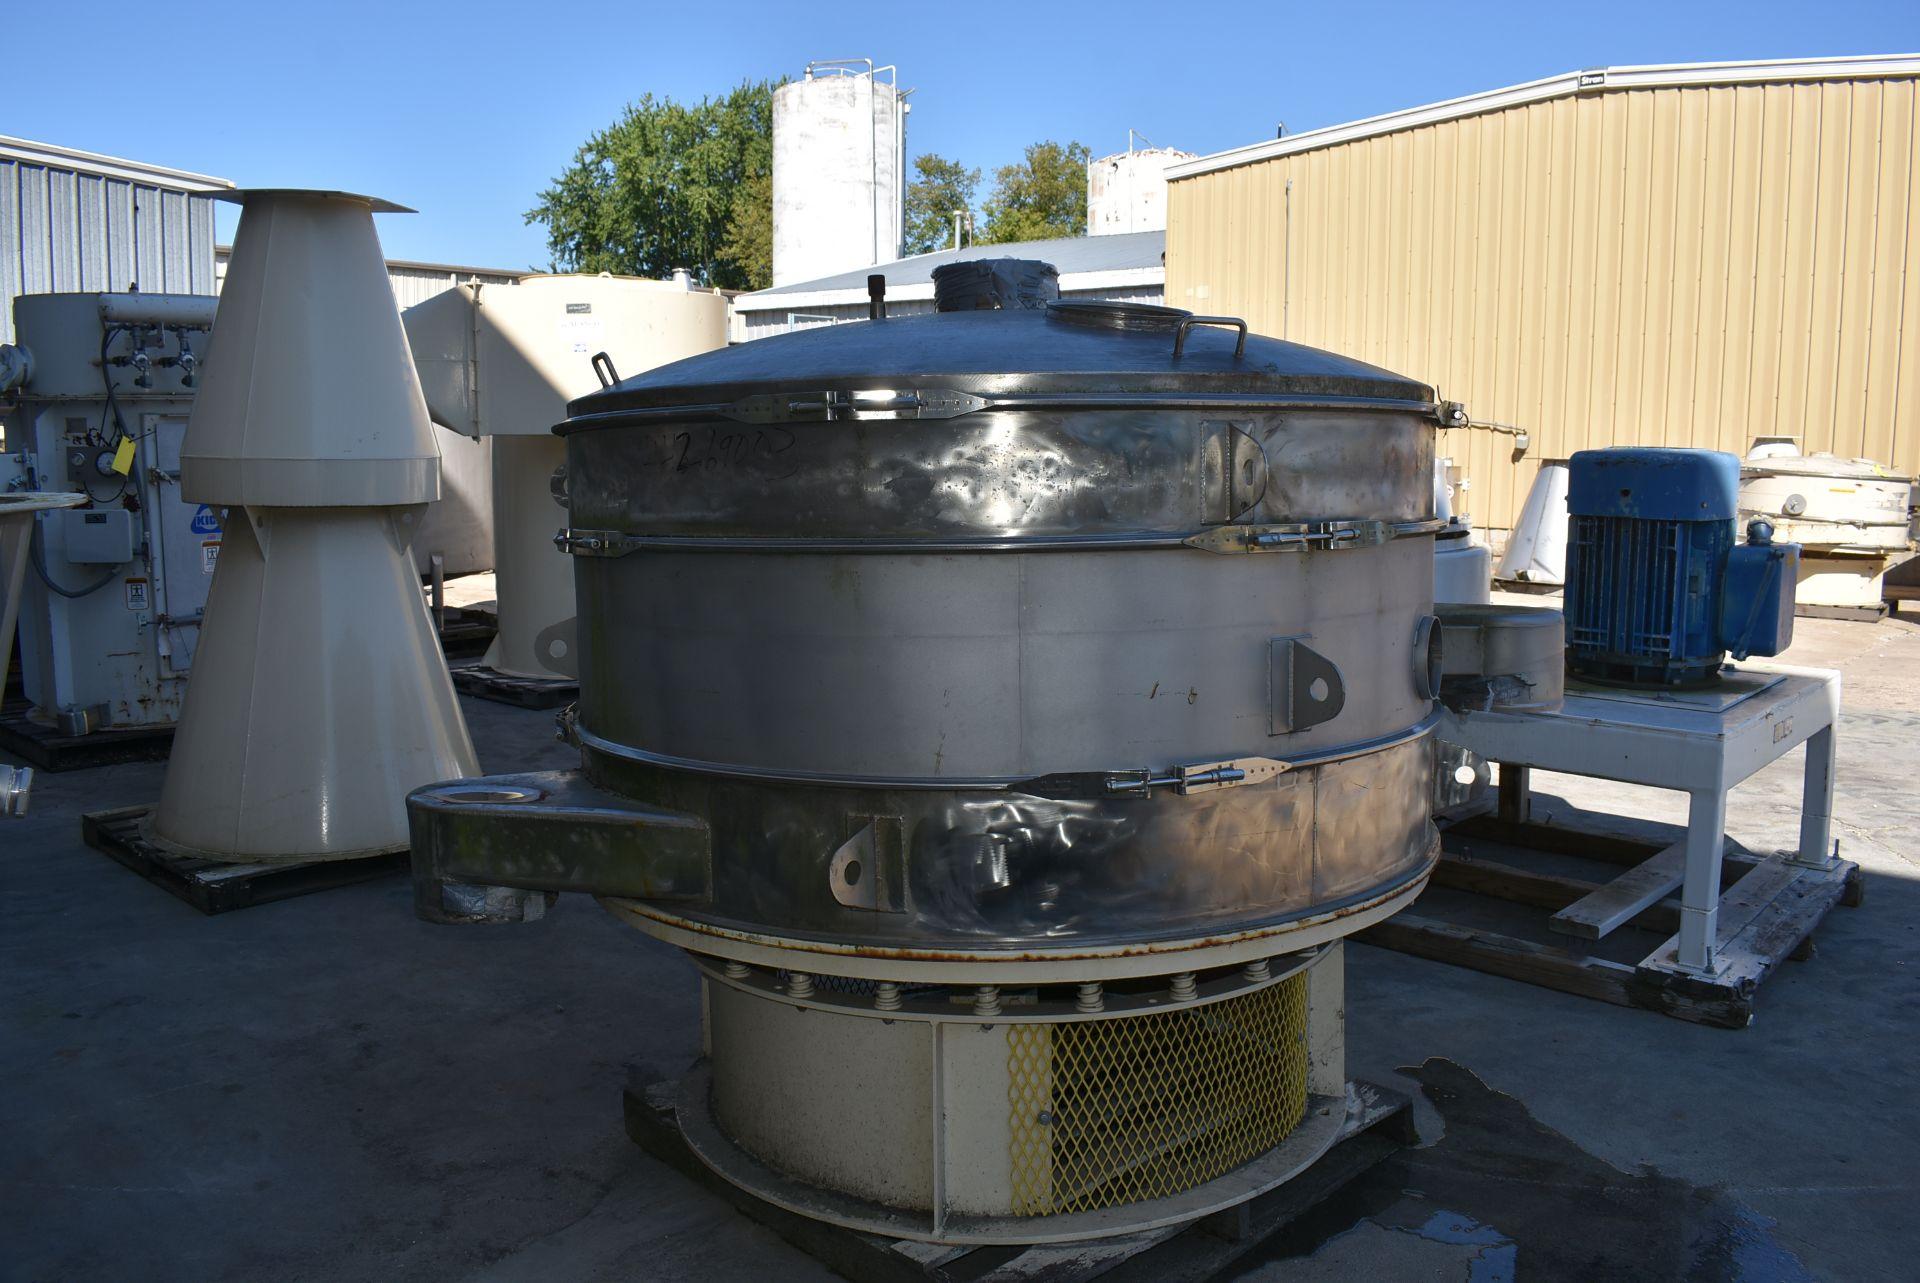 SWECO Model #US72S108 Vibratory Separator, SN 978-50 - Image 3 of 3